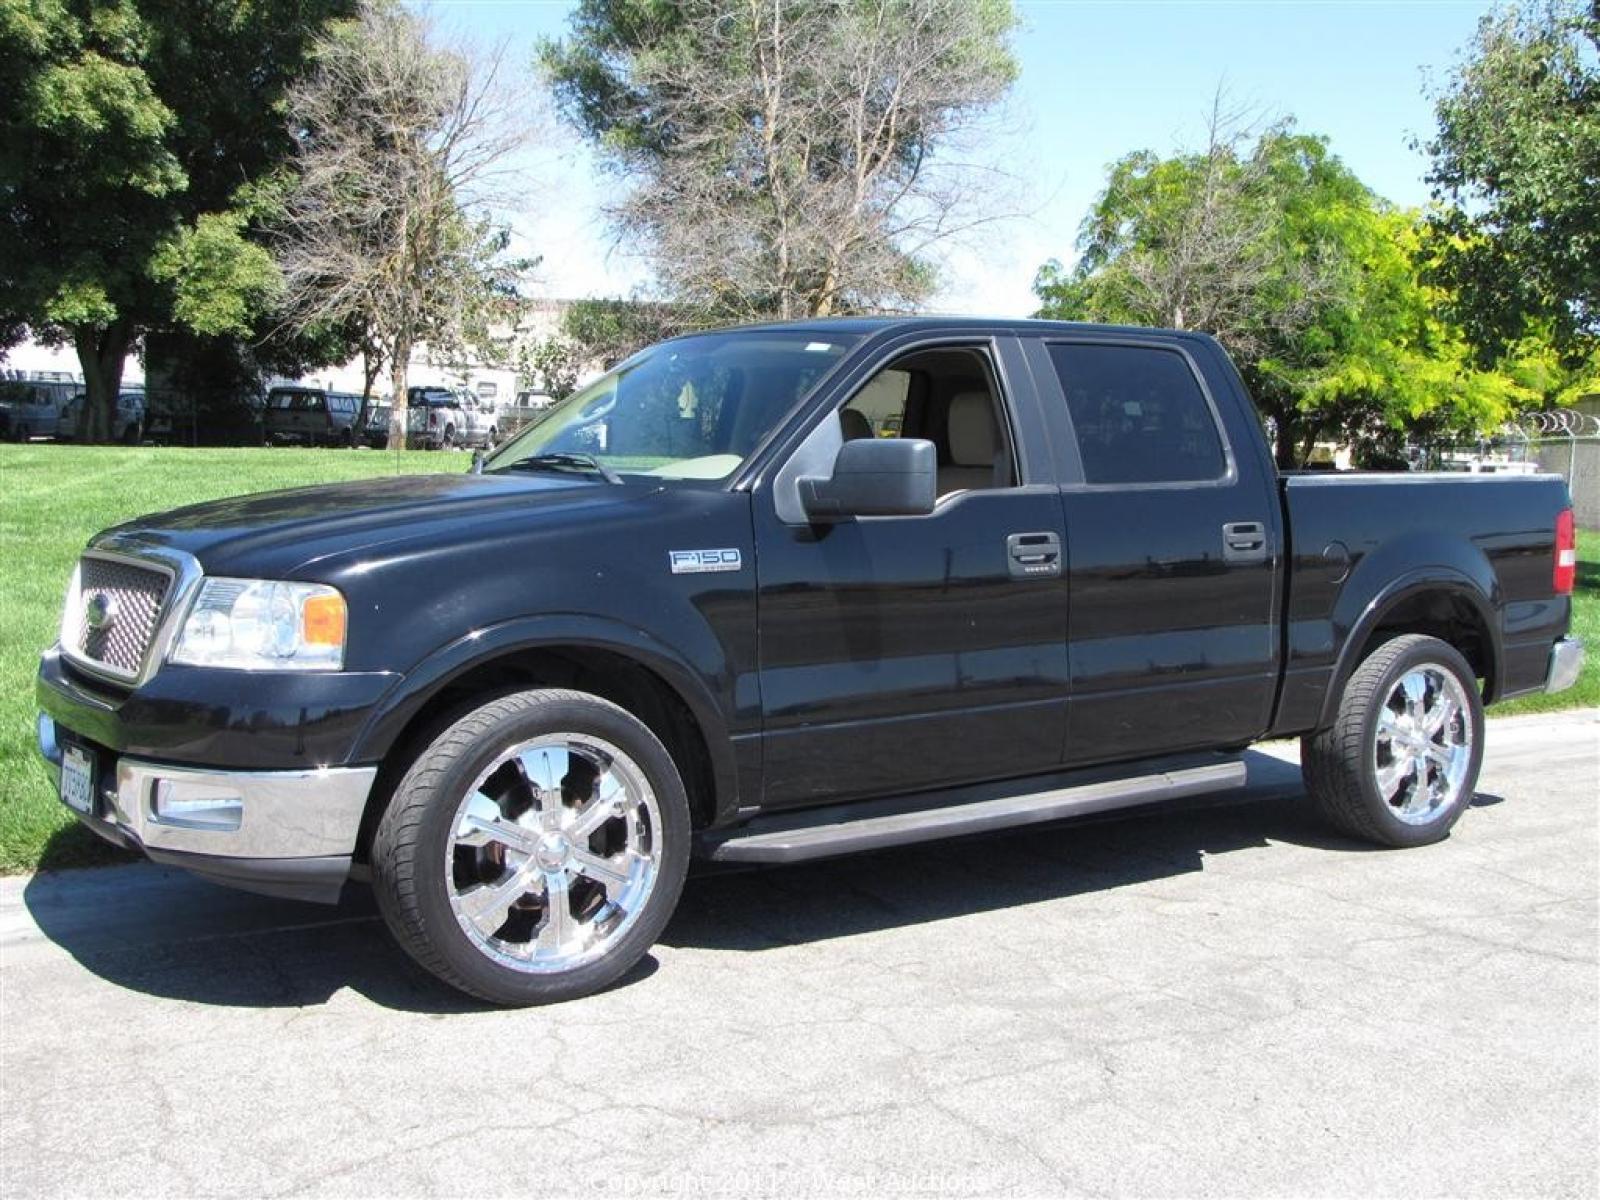 800 1024 1280 1600 Origin 2005 Ford F 150